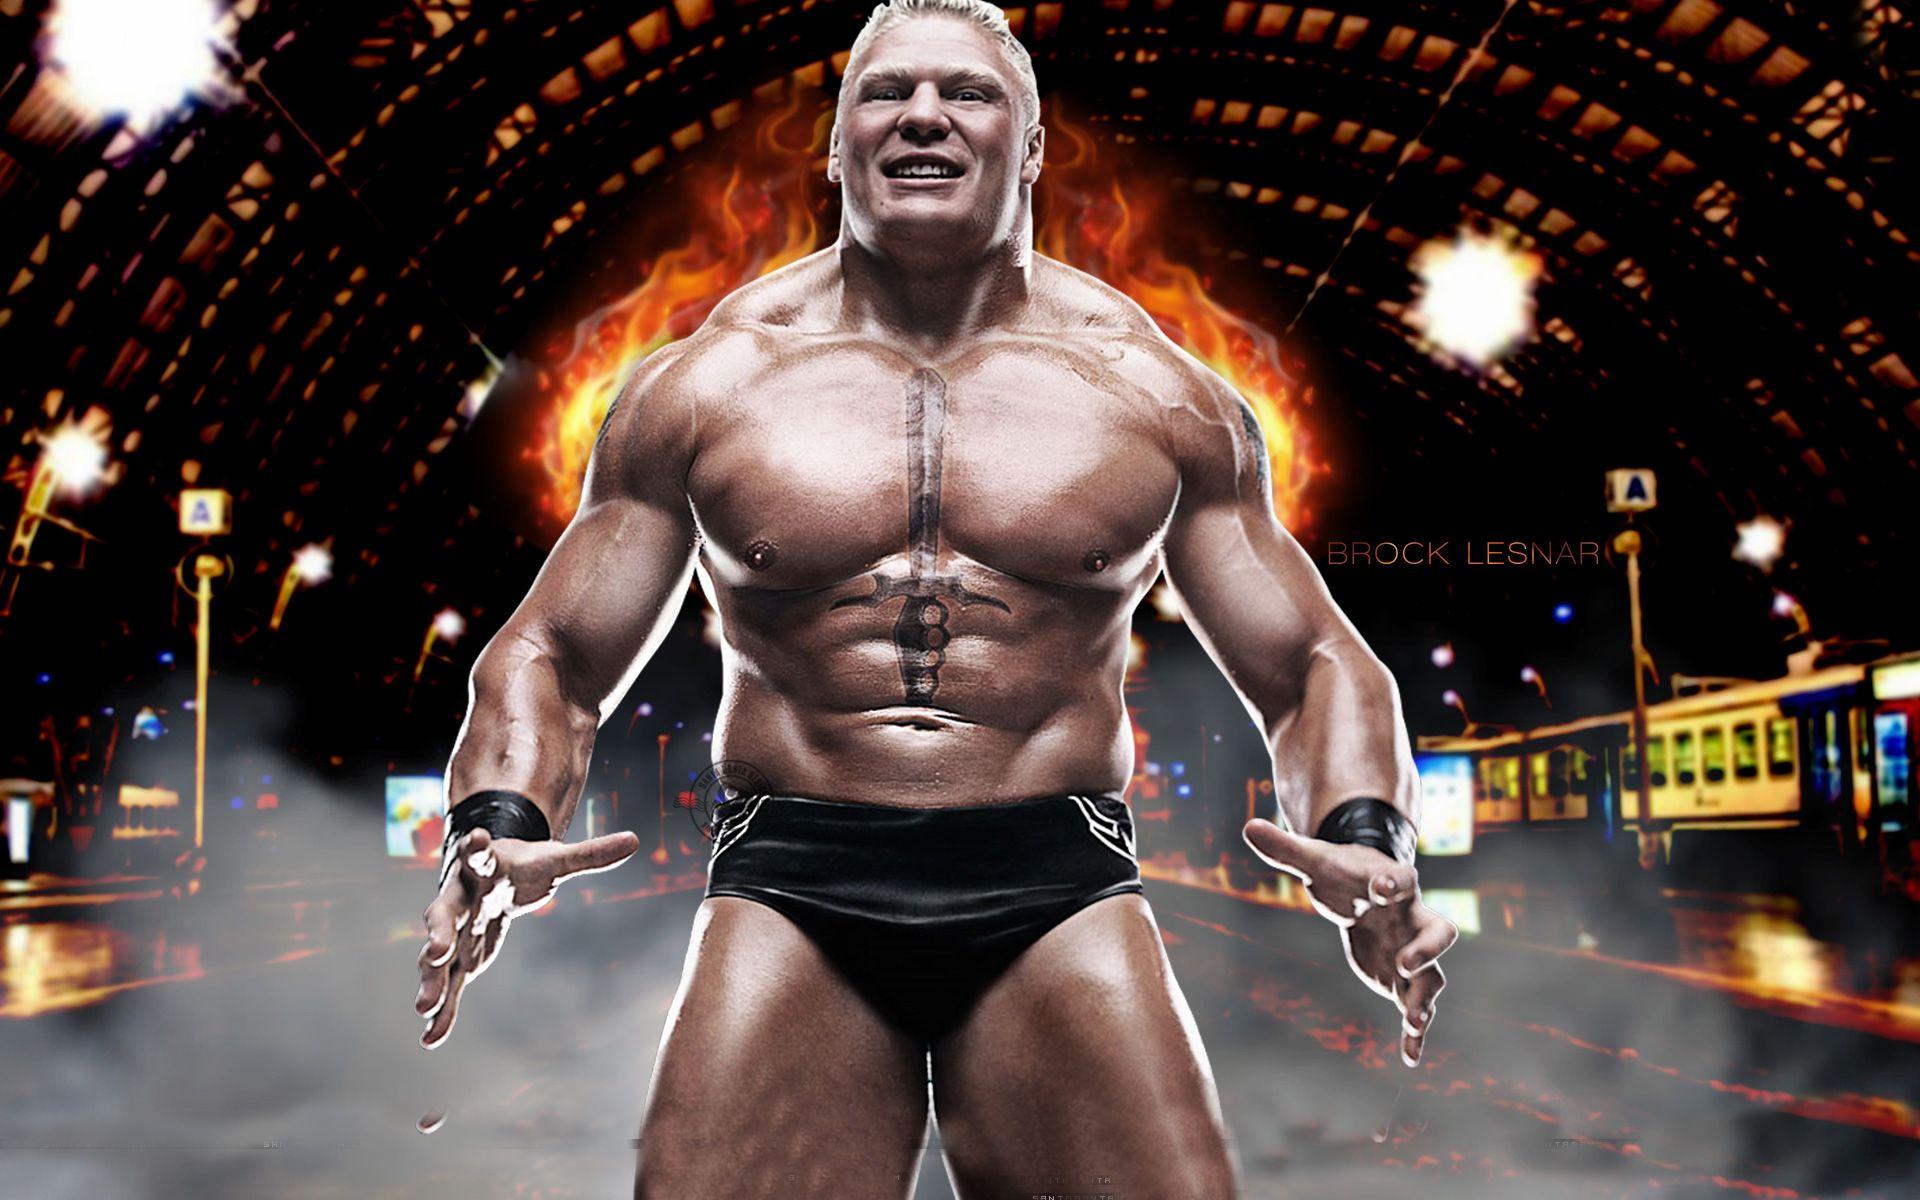 Brock Lesnar wearing a costume